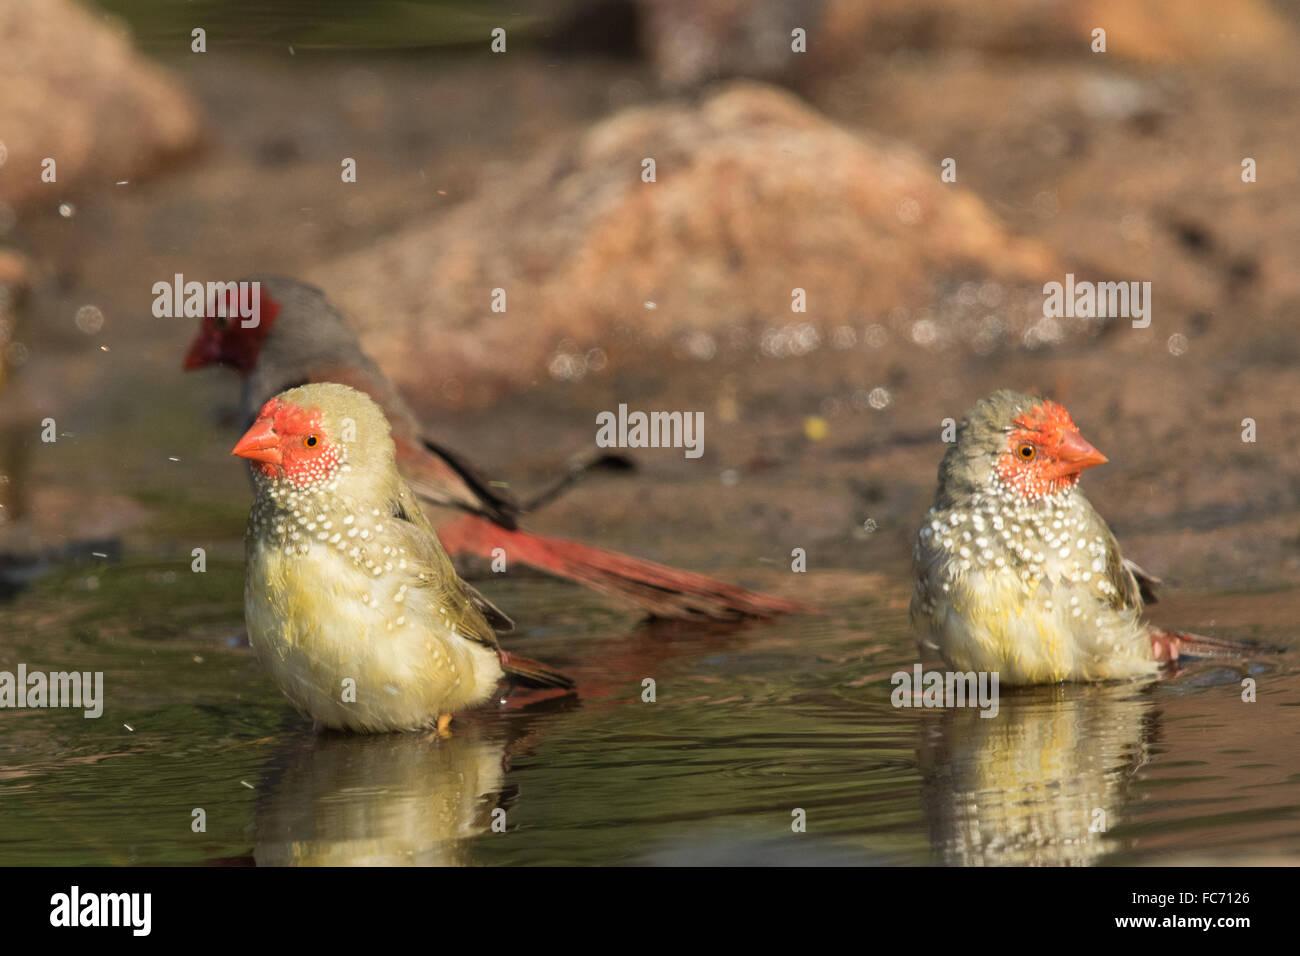 Star Finches (Neochmia ruficauda) bathing - Stock Image